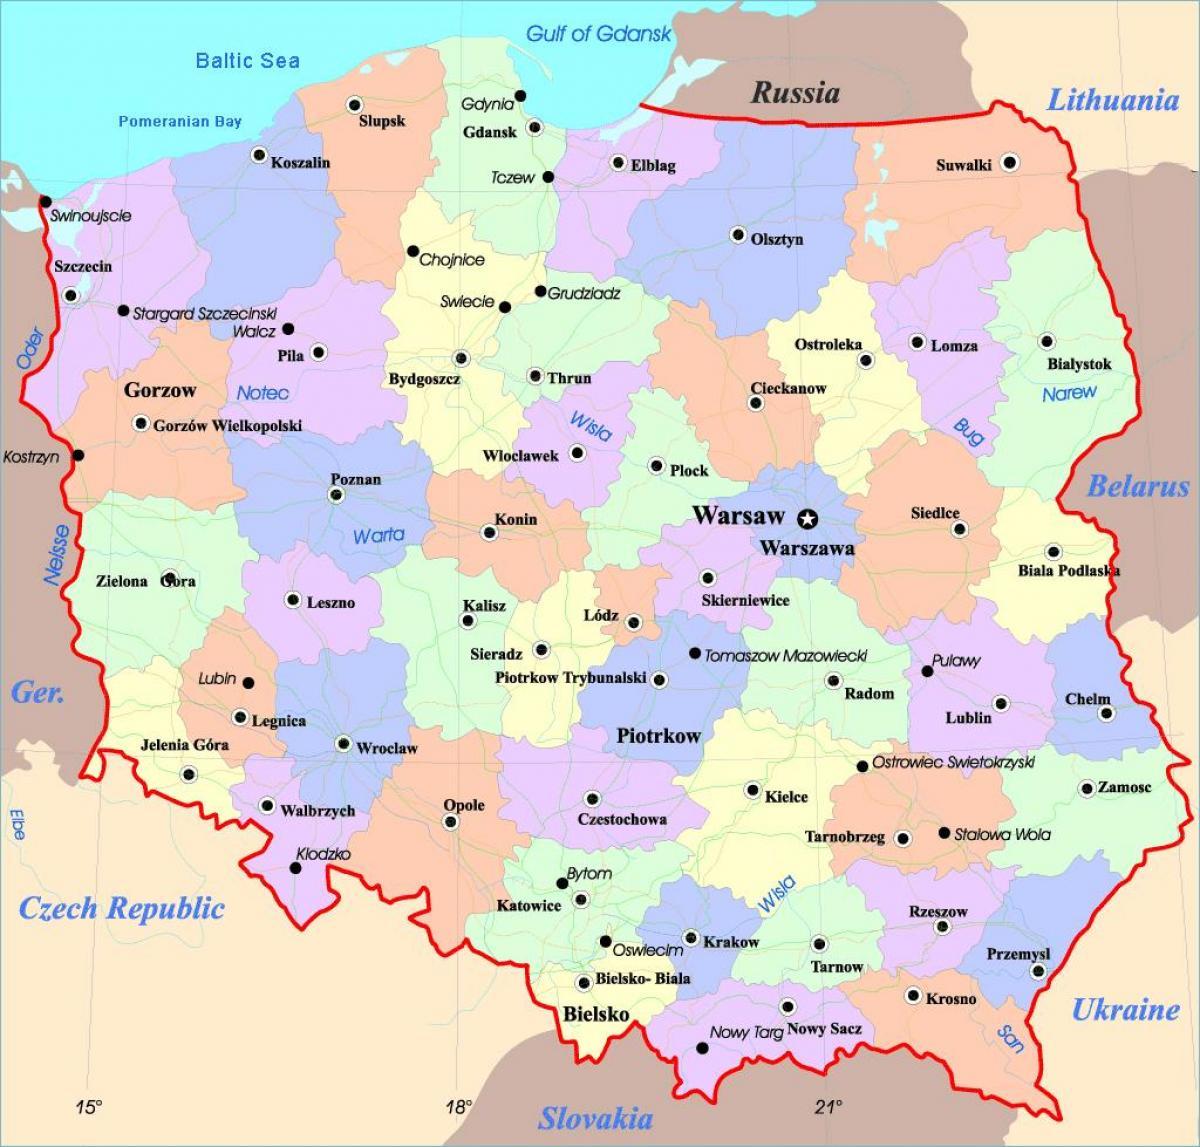 kart polen Polen byer kart   Kart over Polen byer (Øst Europa   Europa)